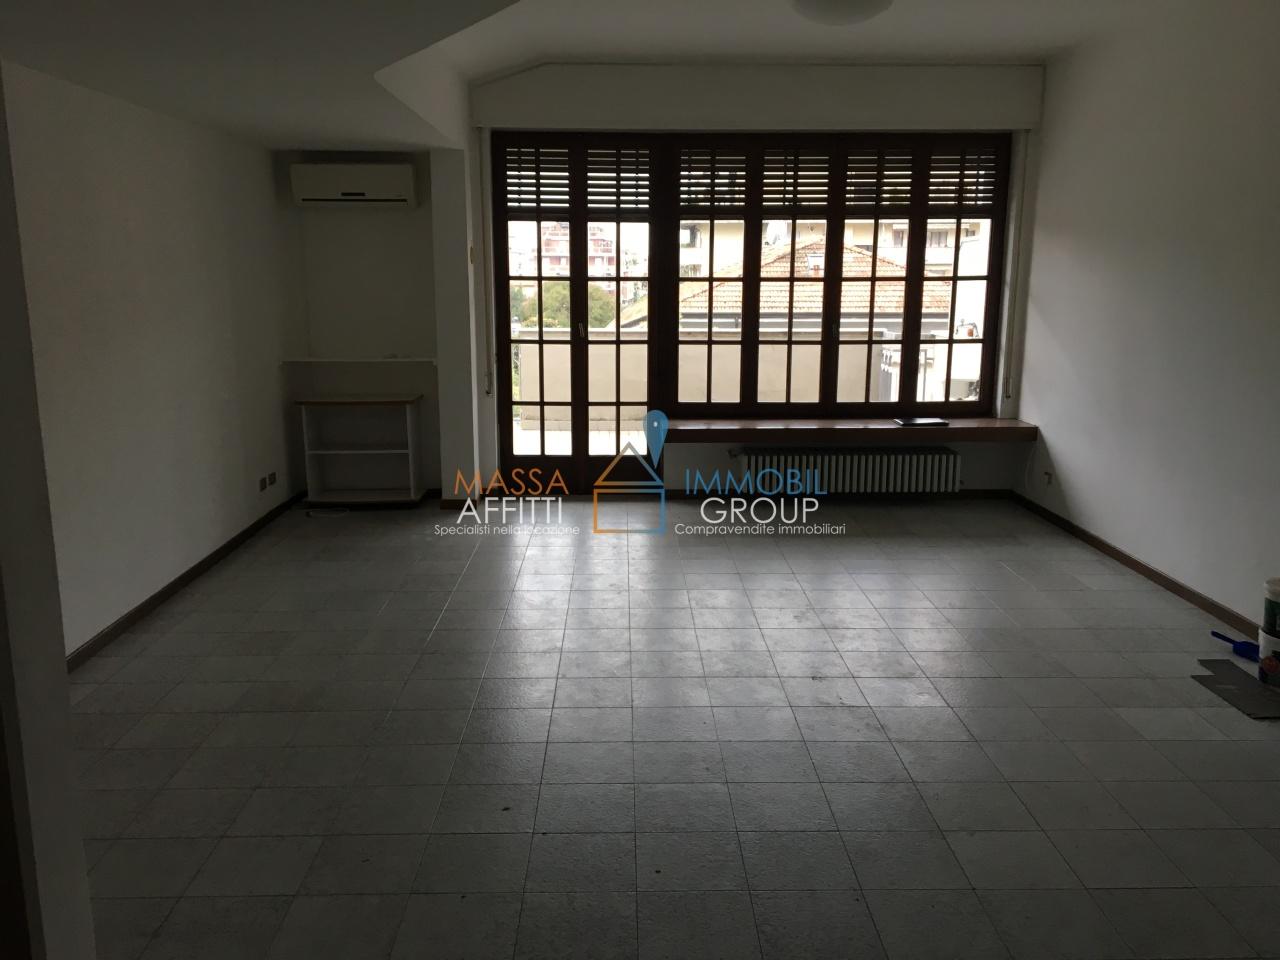 Appartamento - Attico a Avenza, Carrara